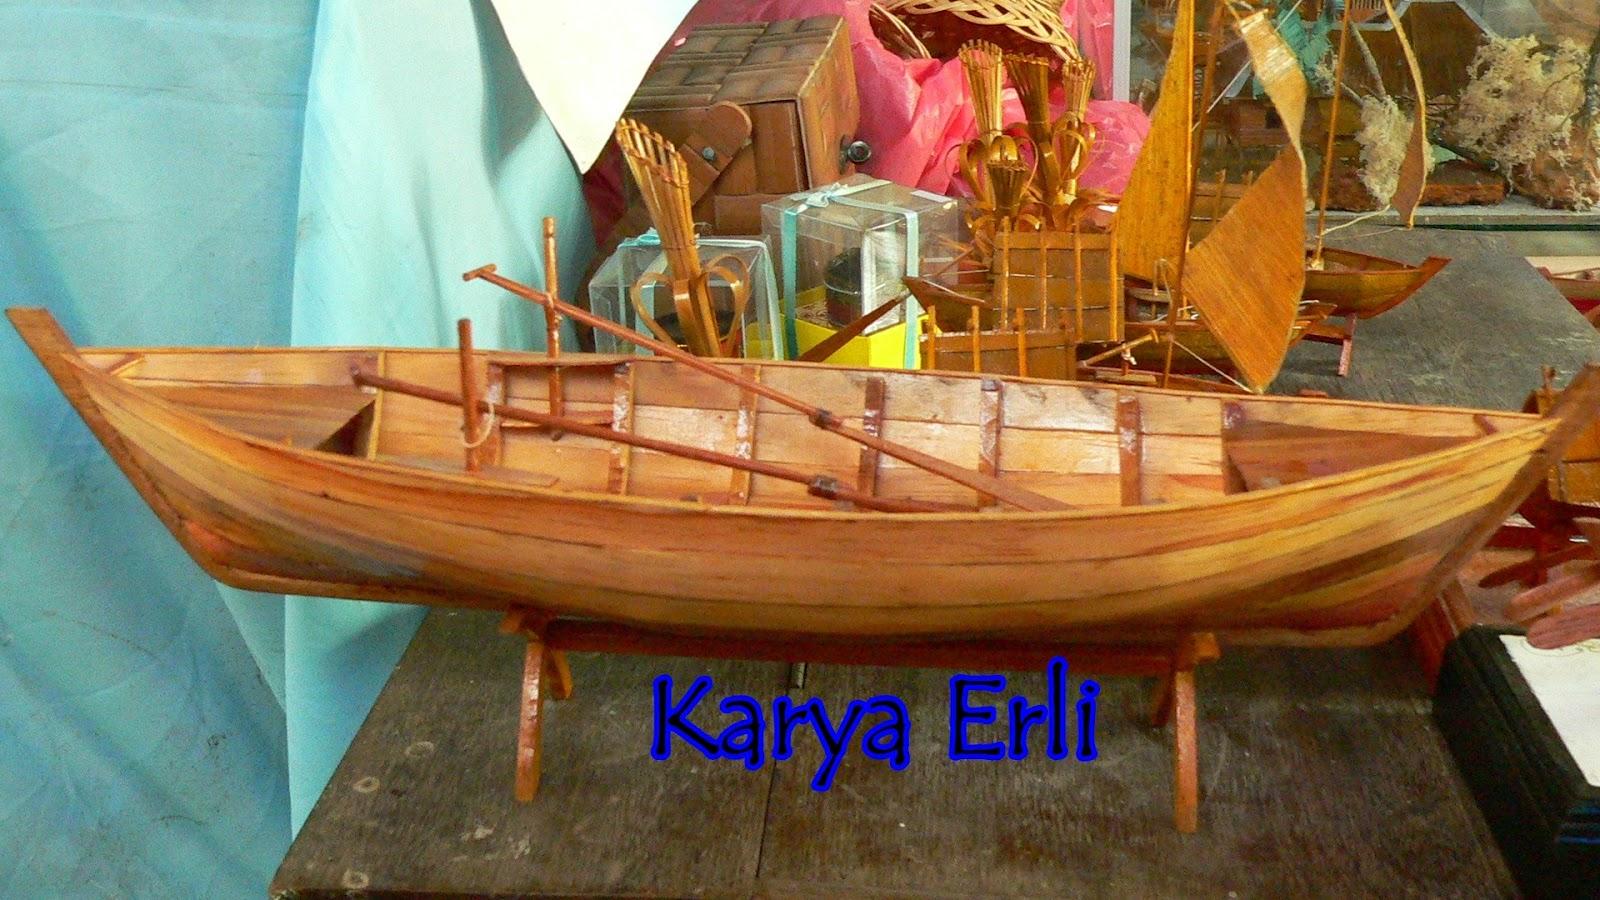 bambu karya erli miniatur kapal nelayan pulau bintan karya erli